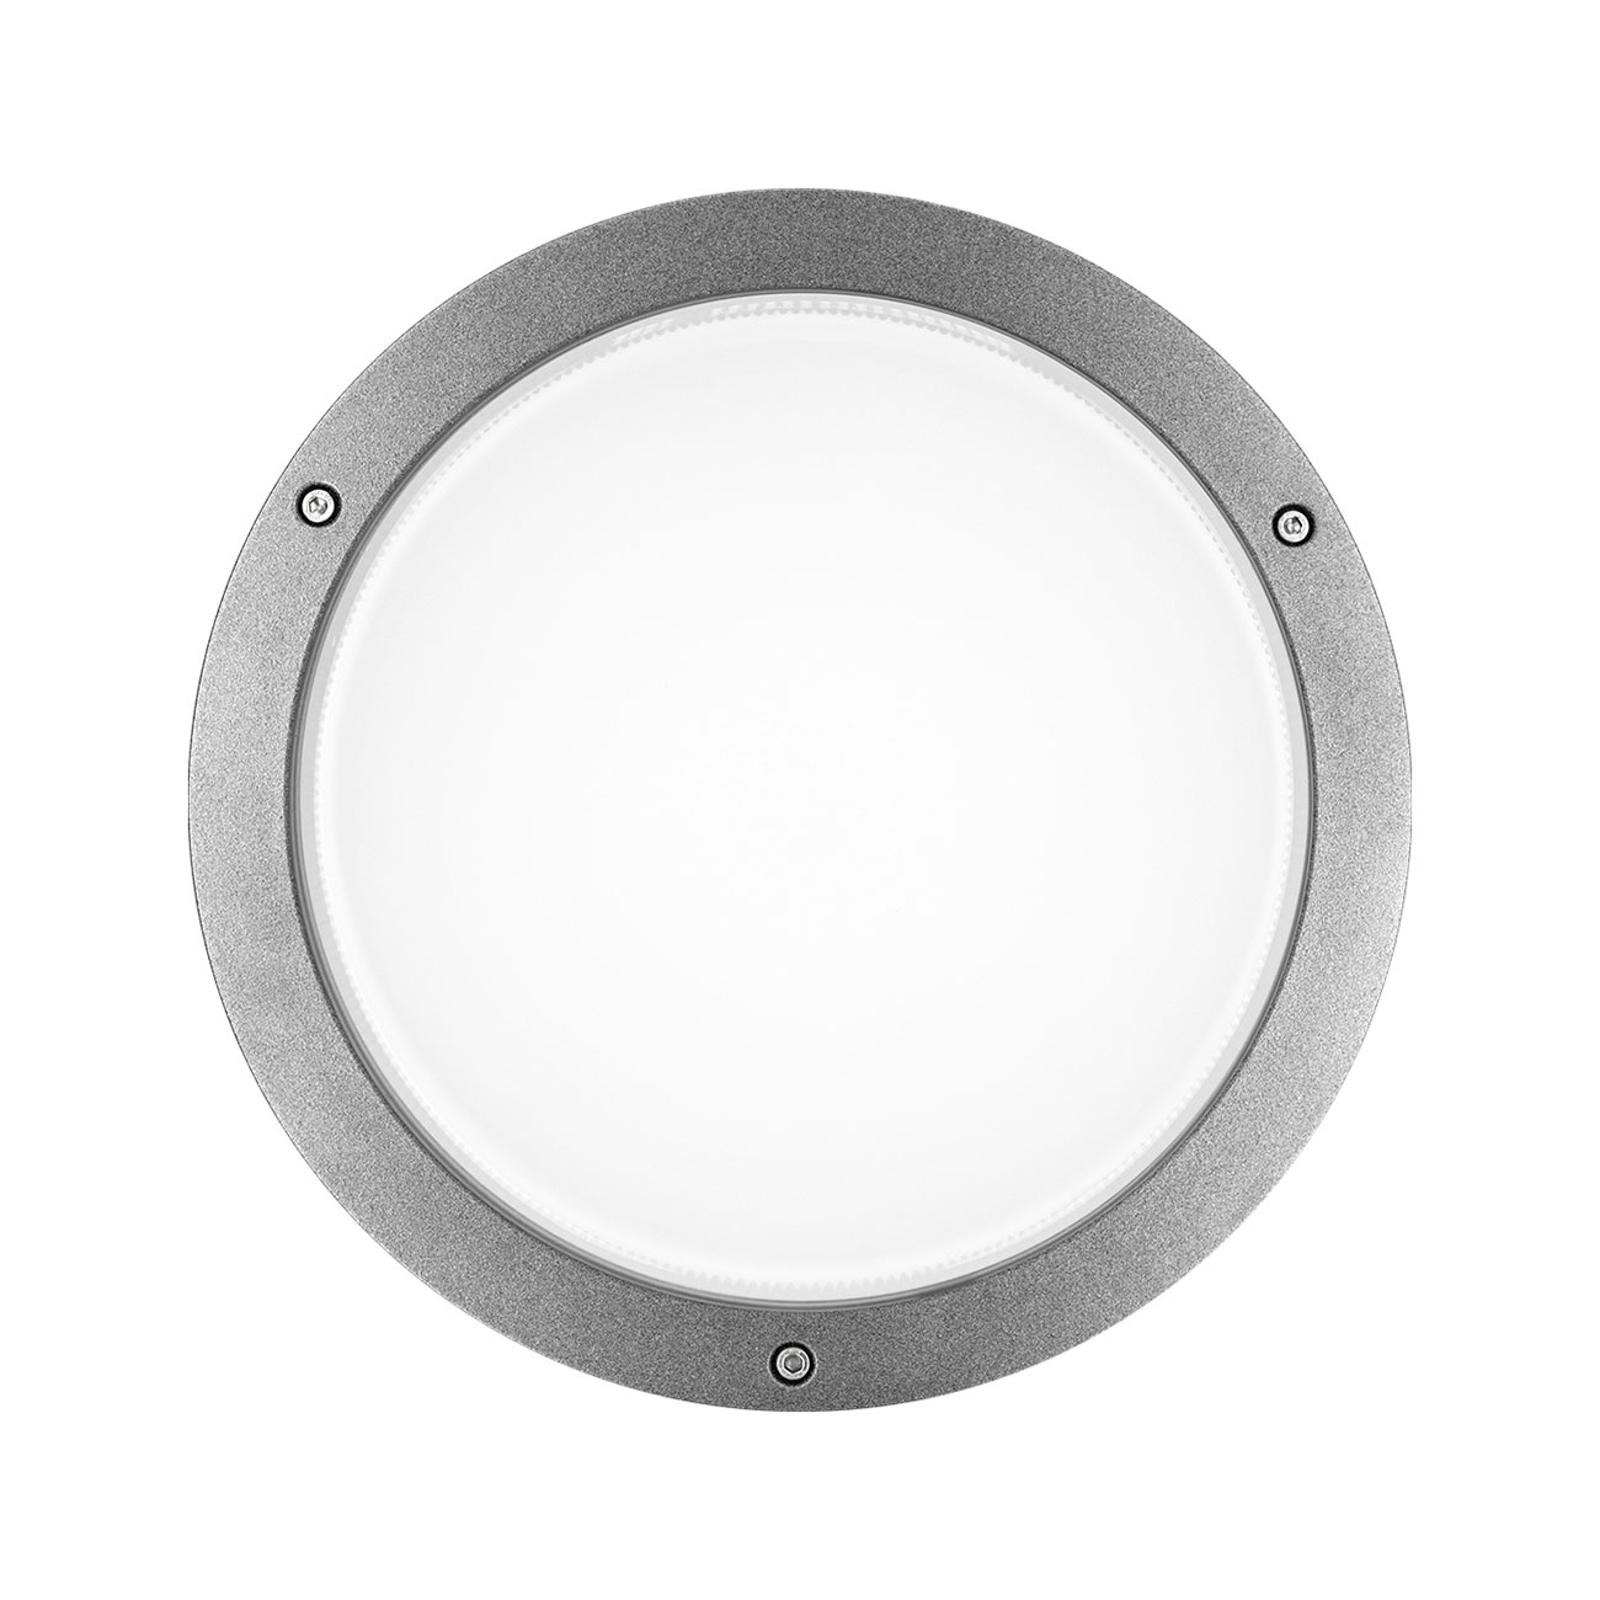 Applique LED Bliz Round 30 3000K grise dimmable